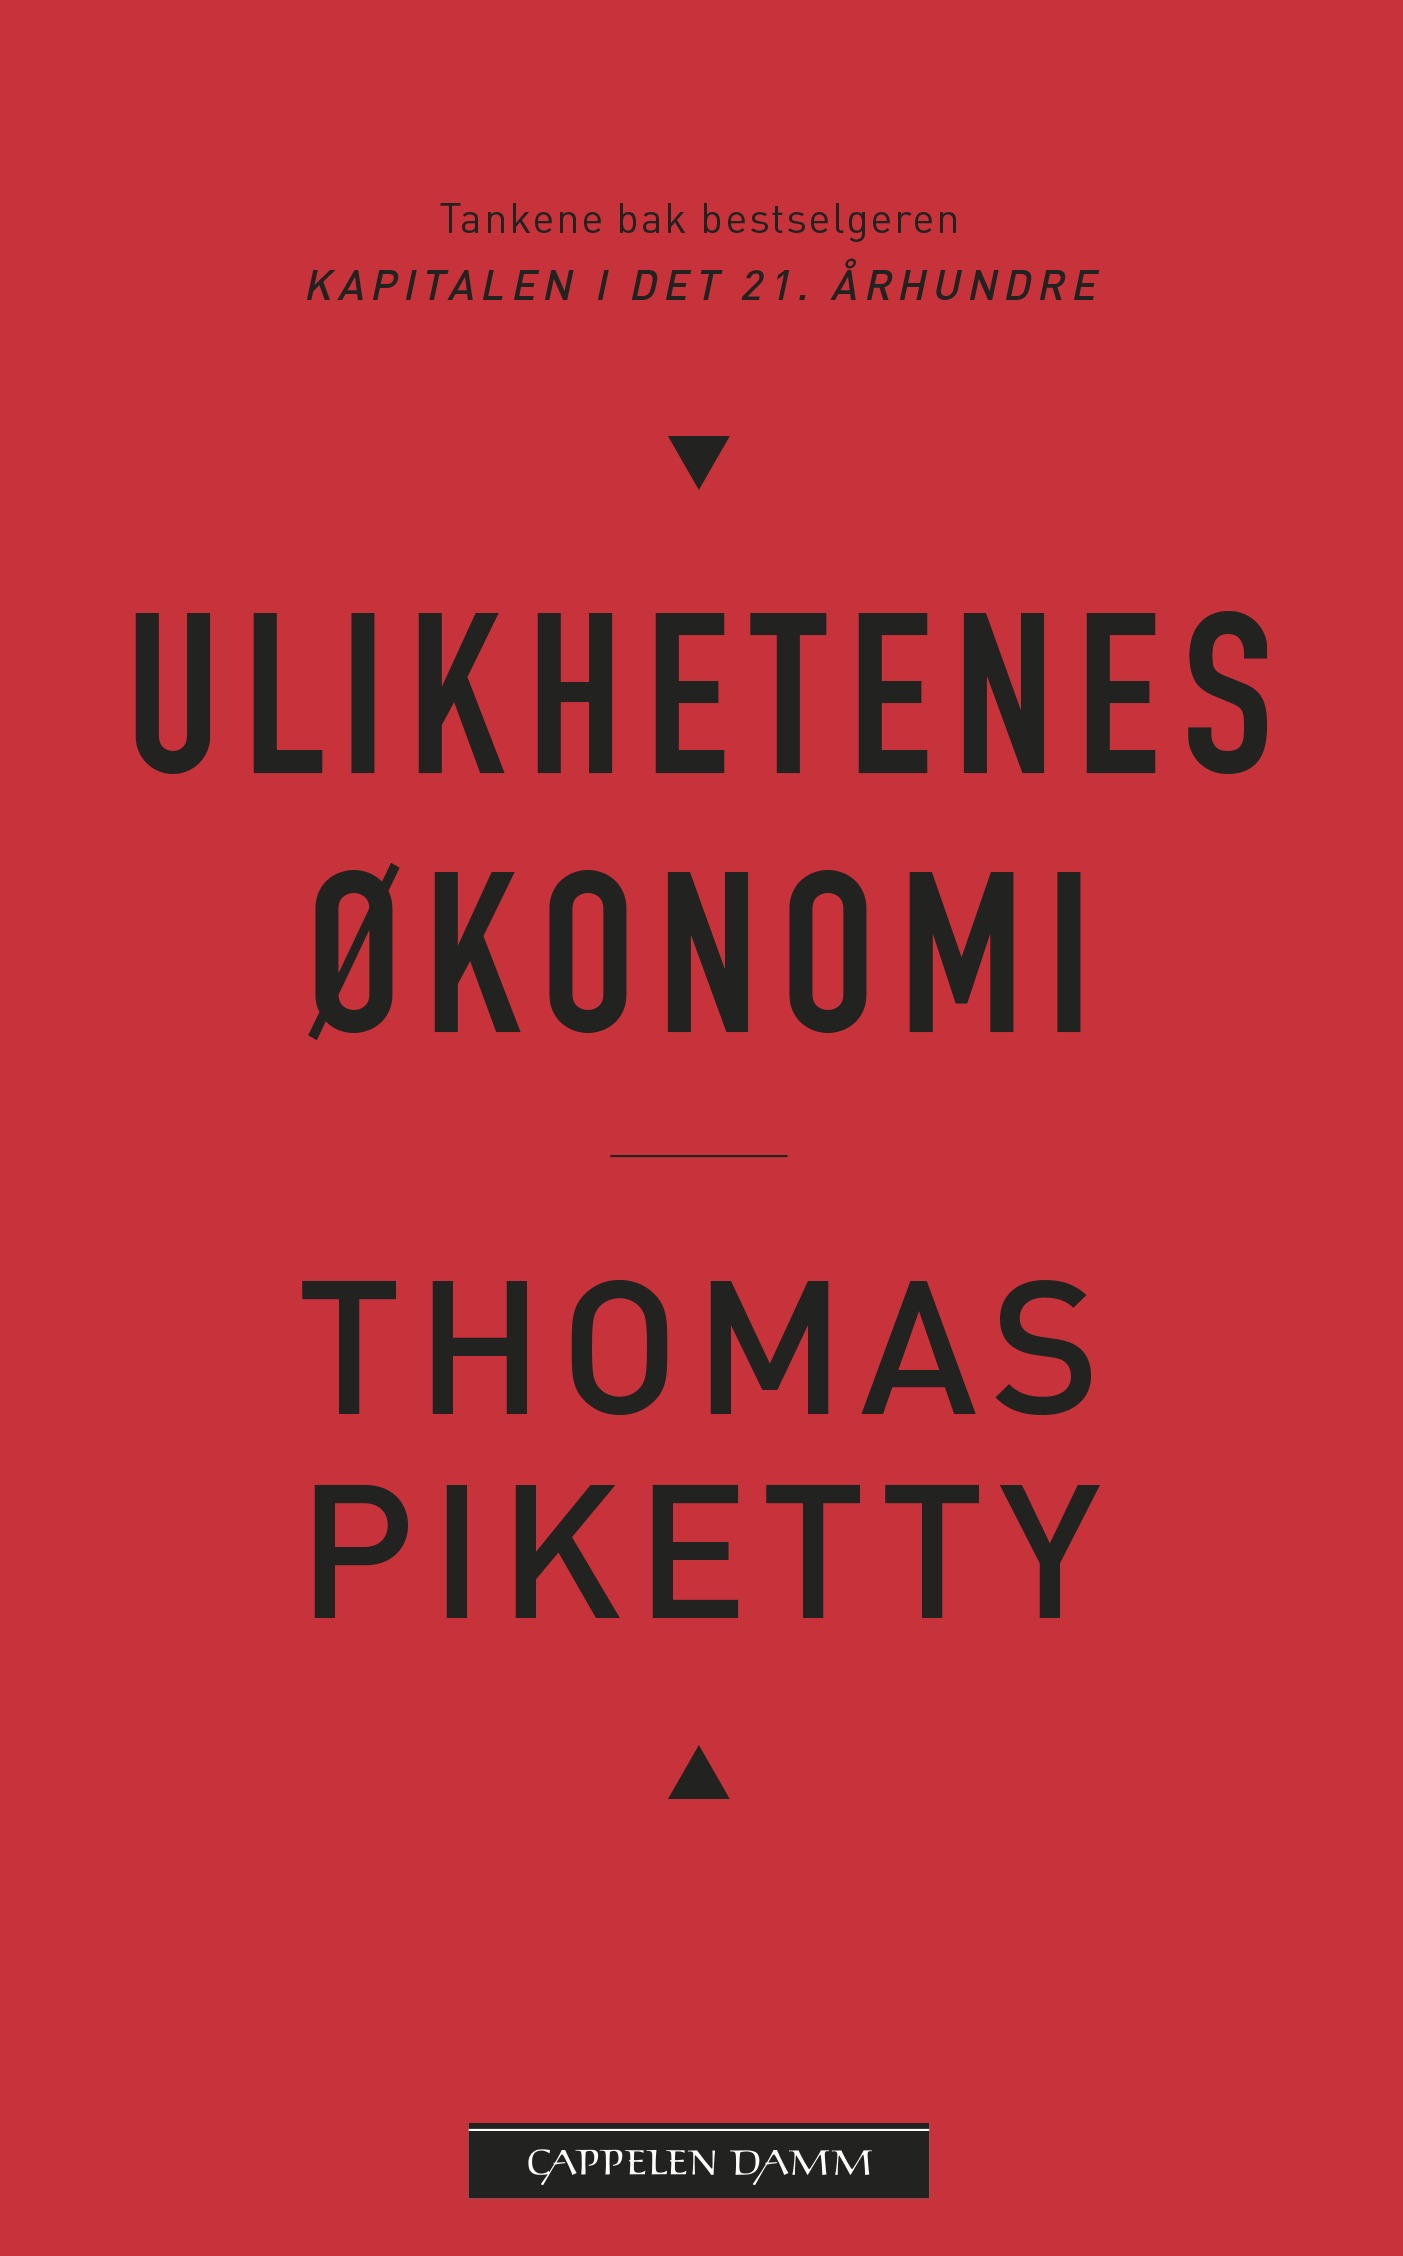 Thomas Piketty: Ulikhetens økonomi